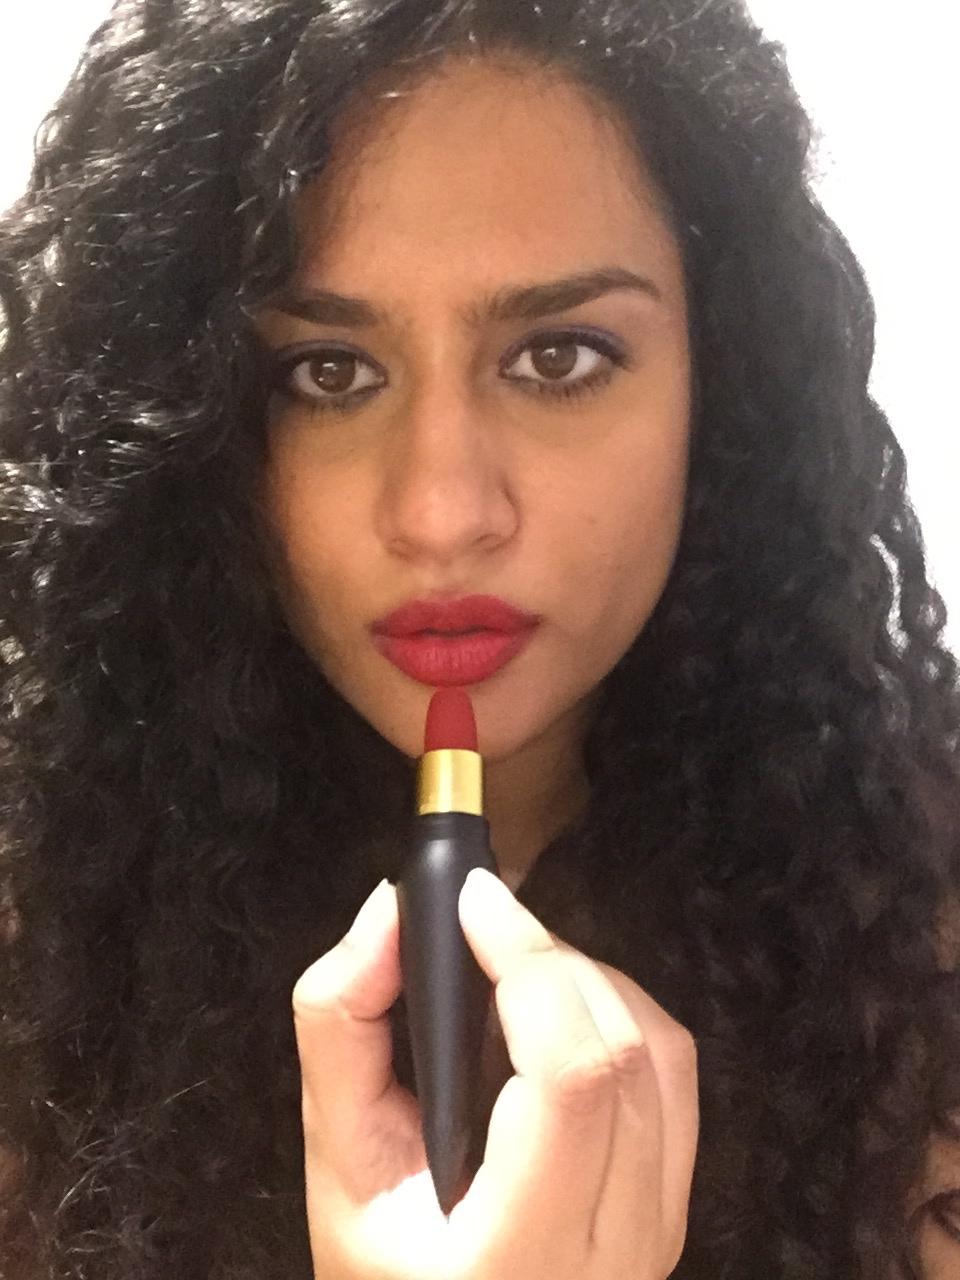 christian-louboutin-lipstick-11.jpg